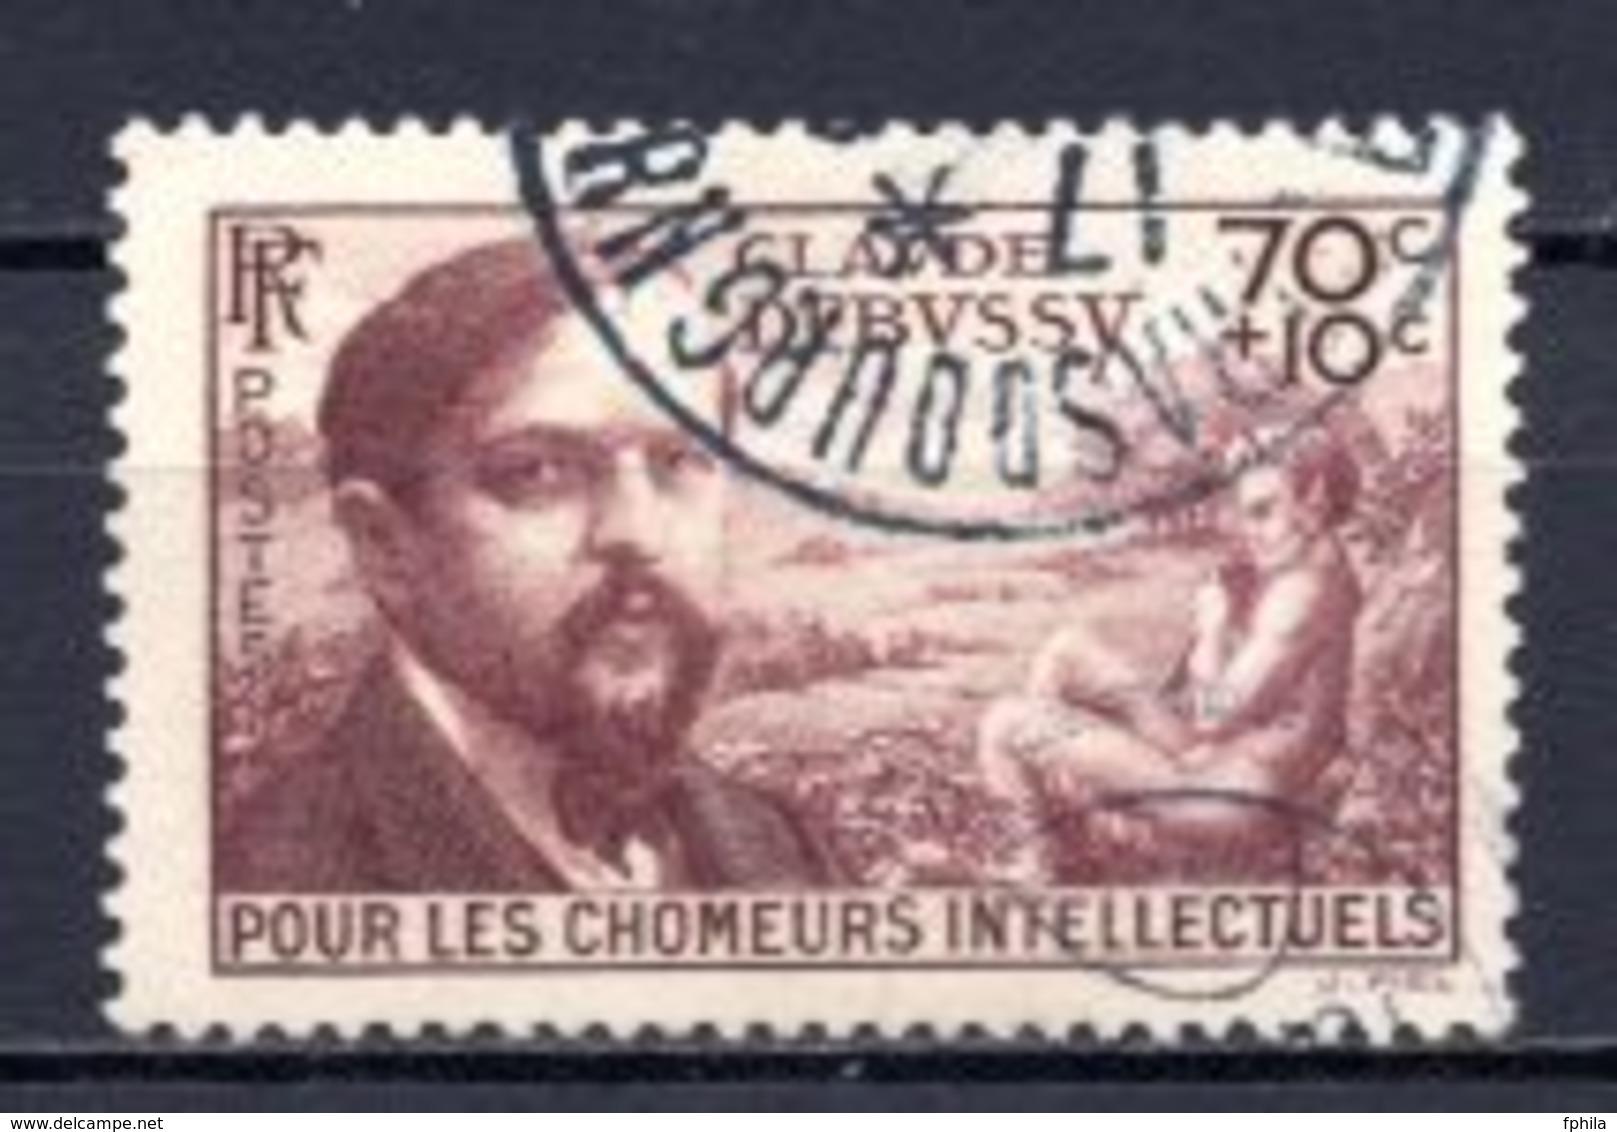 1939 FRANCE 70C.+10C. CLAUDE DEBUSSY MICHEL: 451 USED - Gebraucht